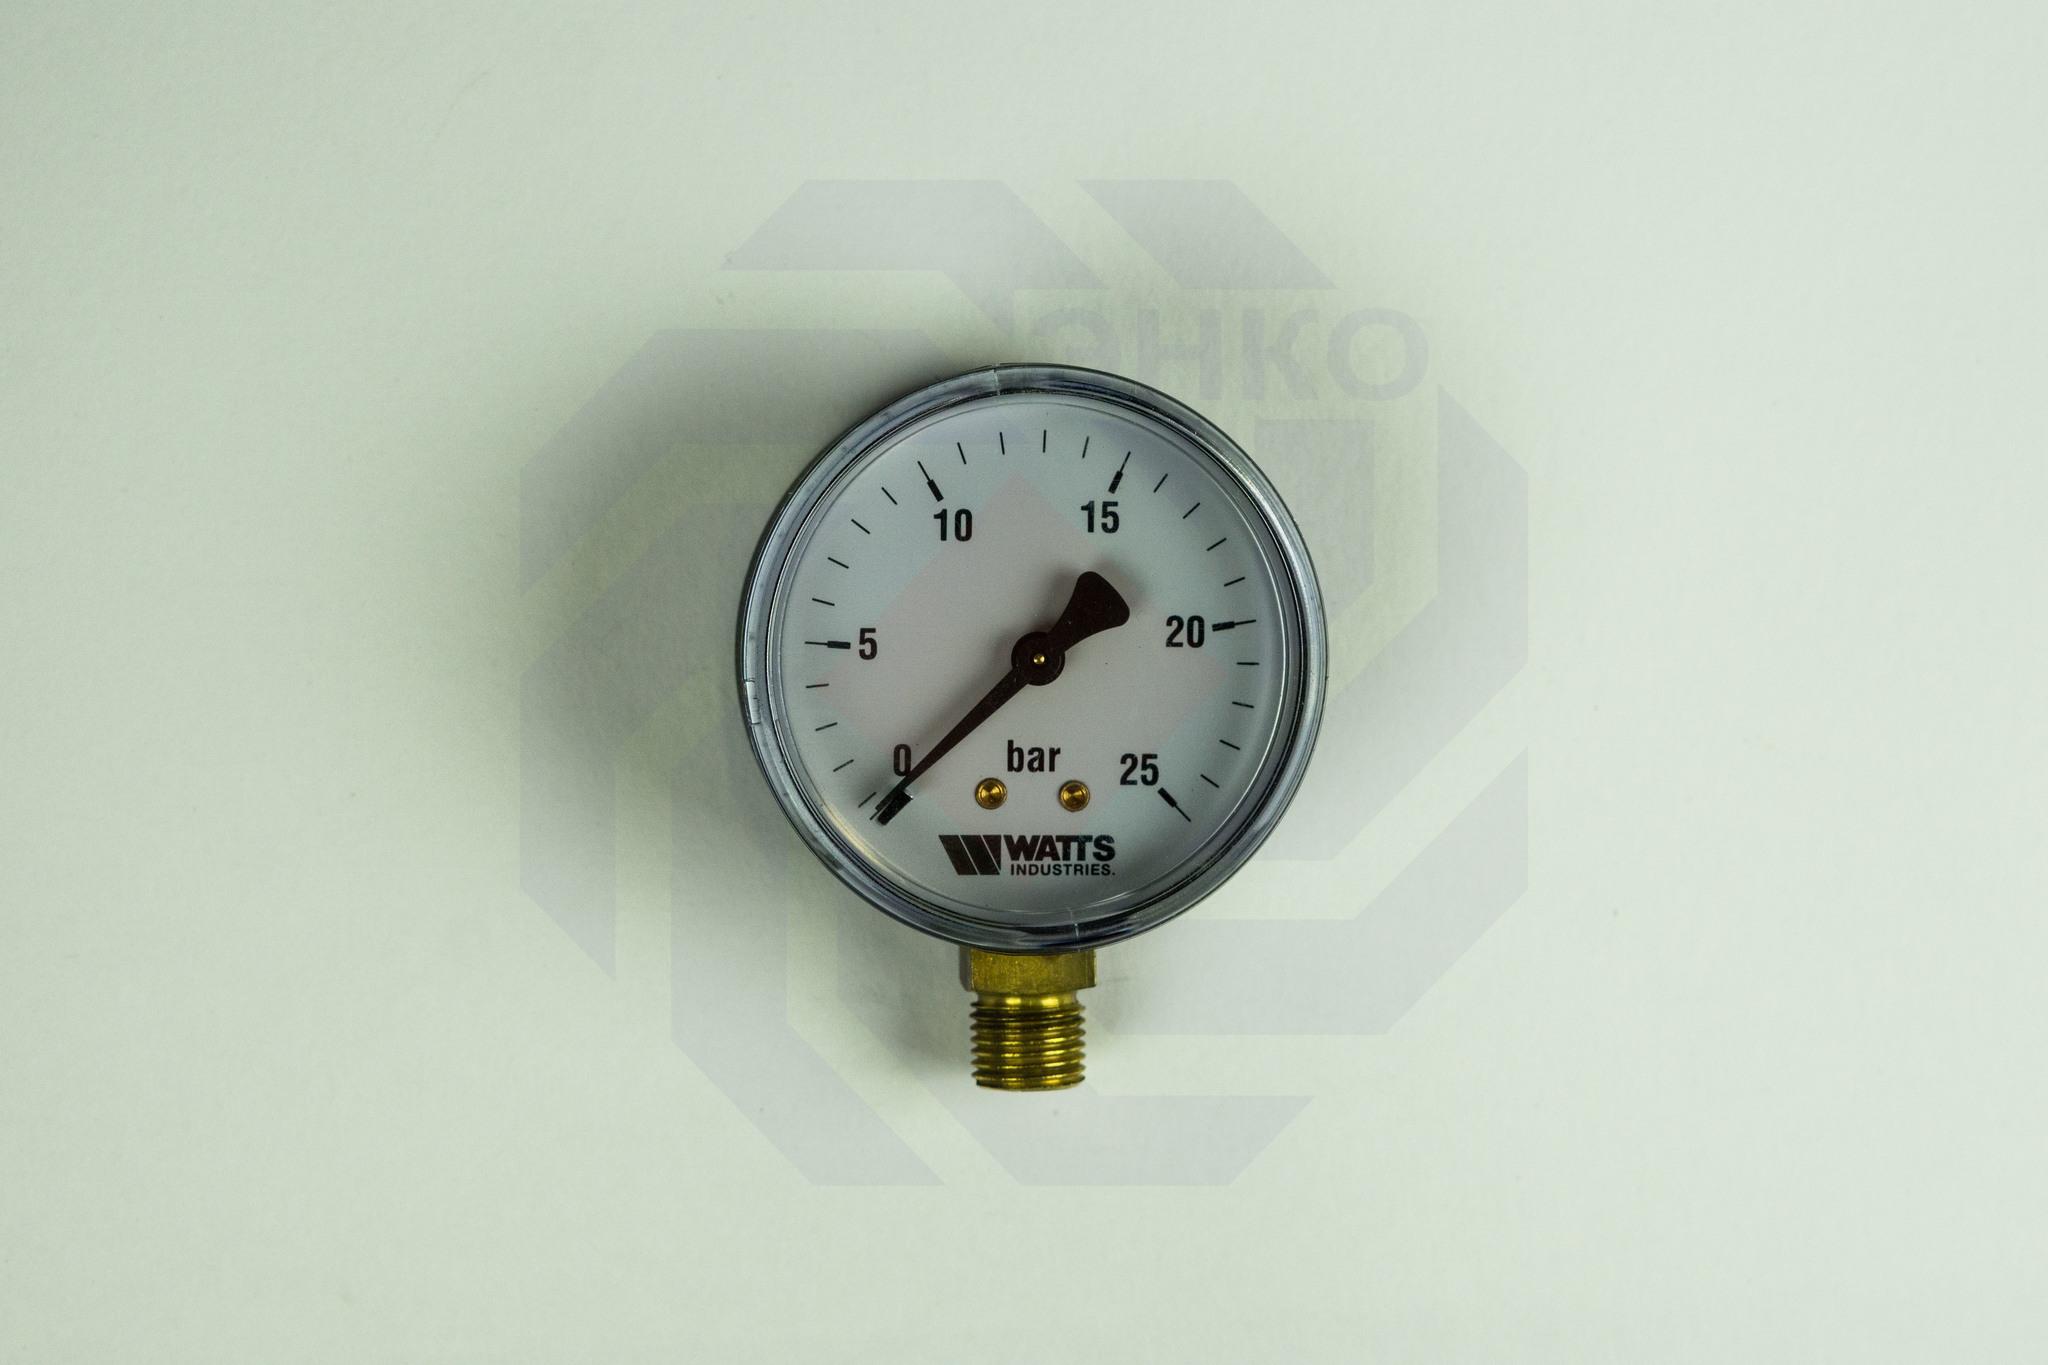 Манометр радиальный WATTS MDR 63/25 (F+R200) 0-25 бар 63 мм ¼